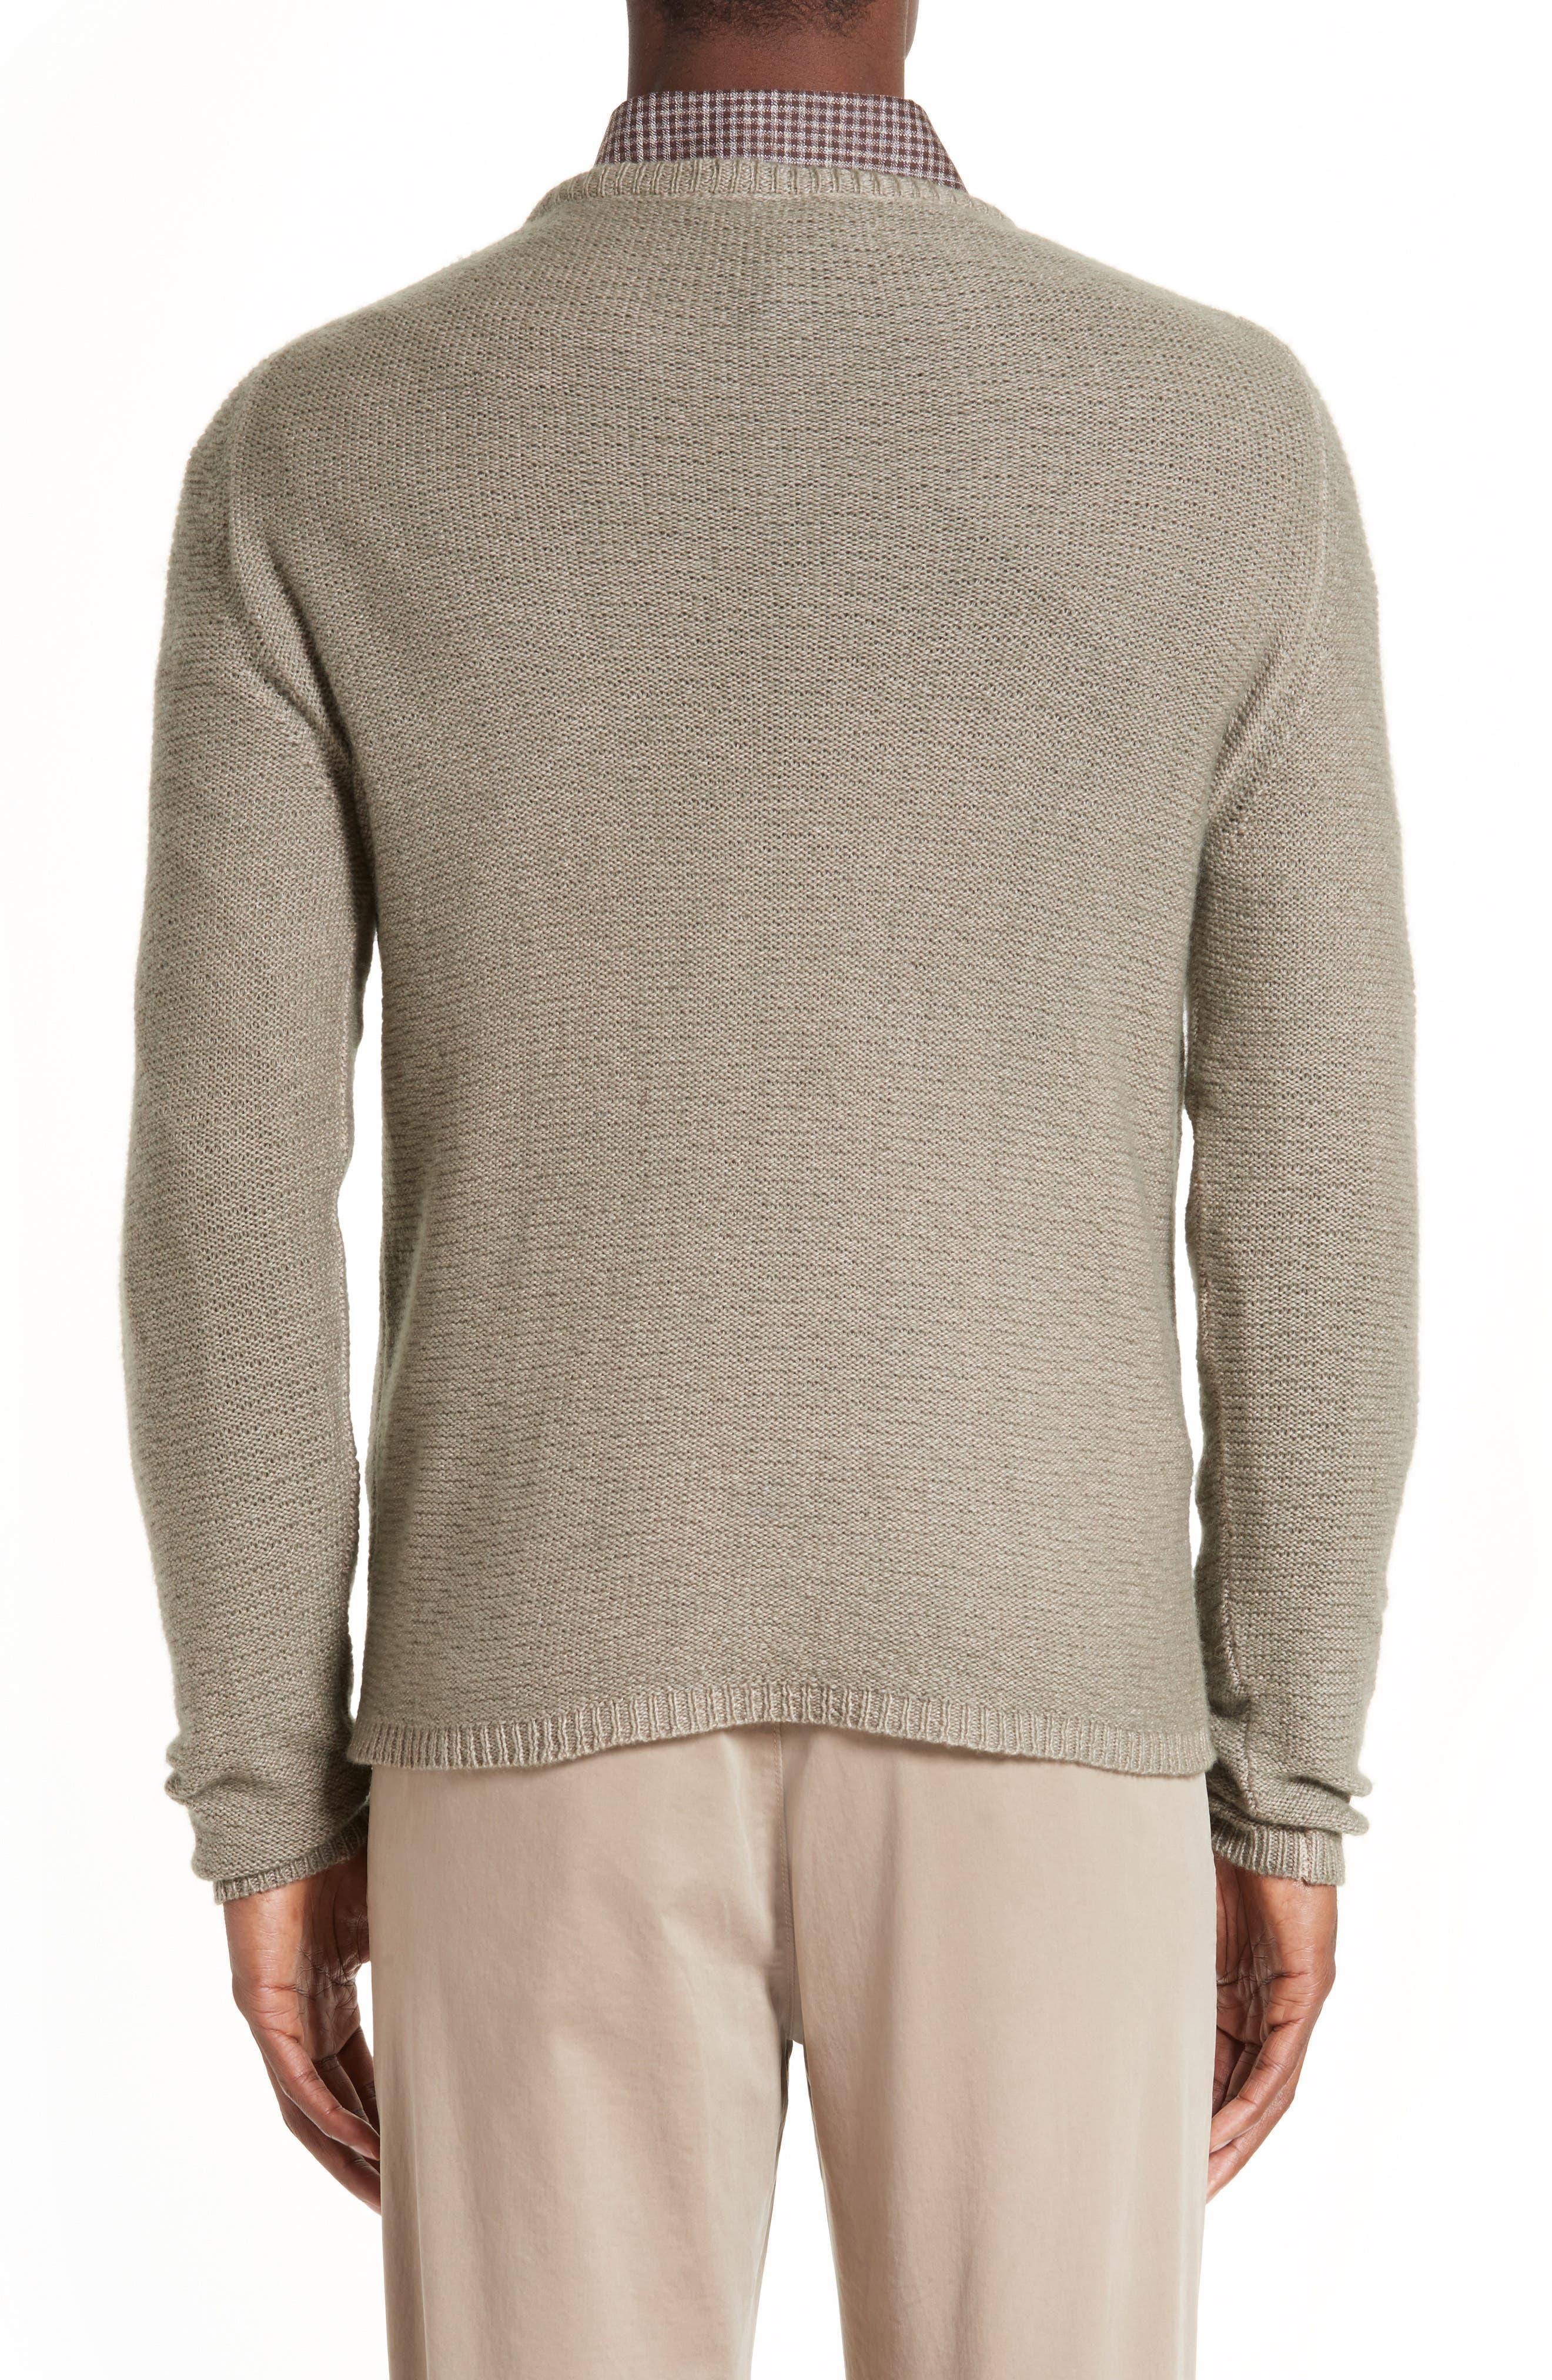 Napoli Slub Cashmere Sweater,                             Alternate thumbnail 2, color,                             200